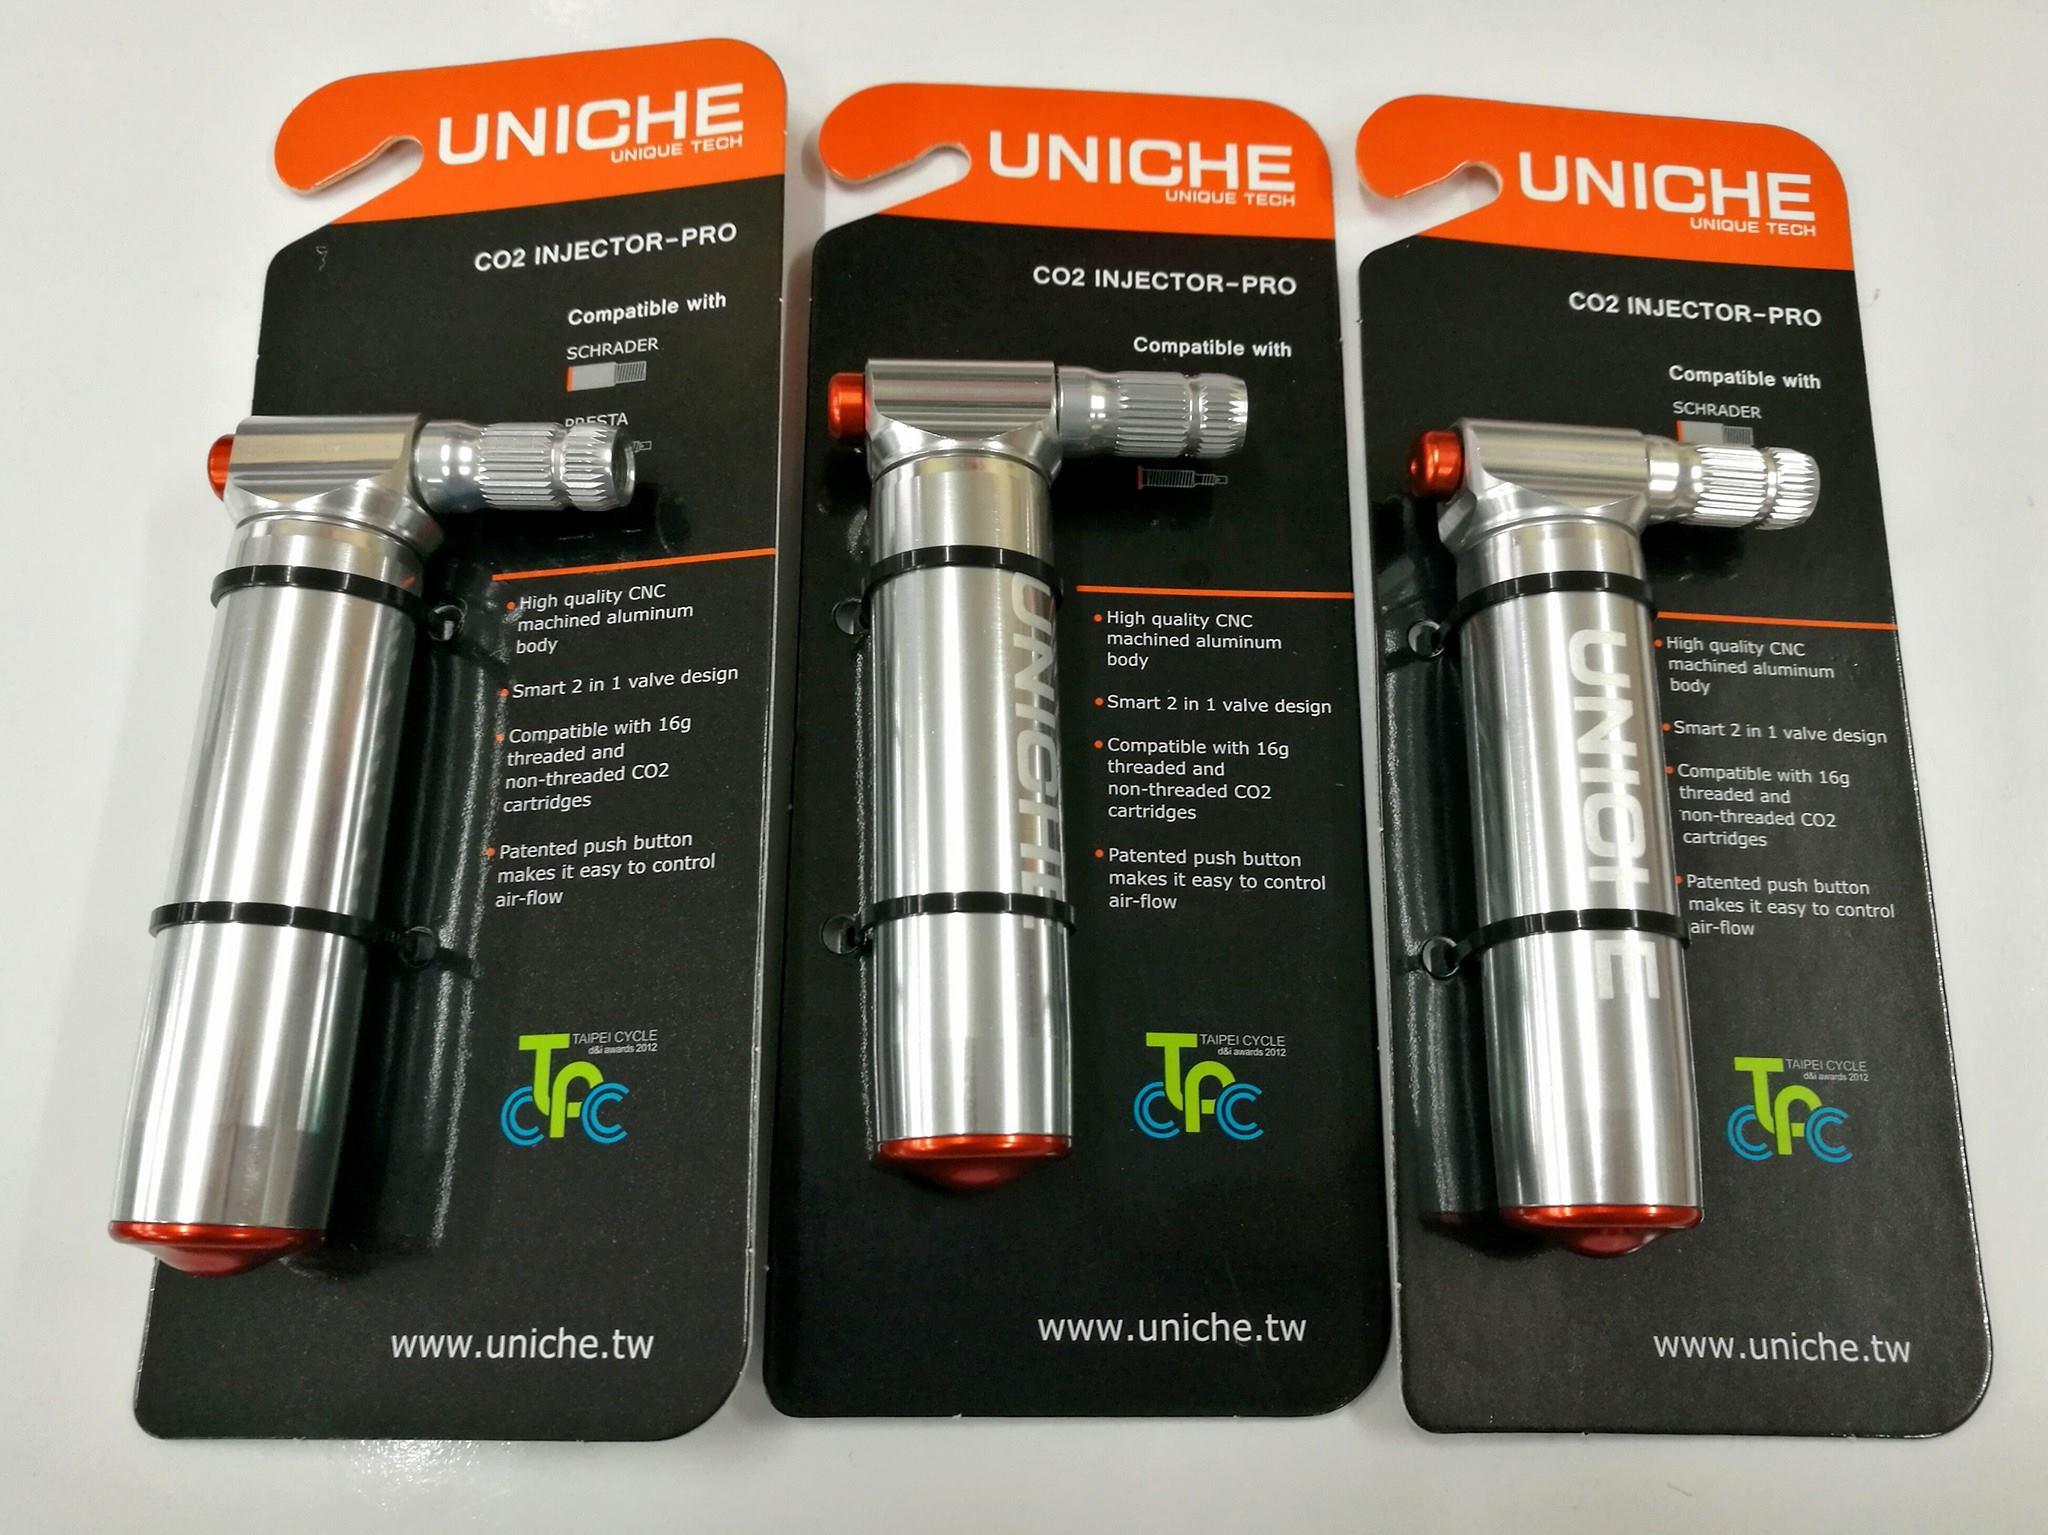 uniche สูบCO2 พร้อมแก๊ส 1 หลอด